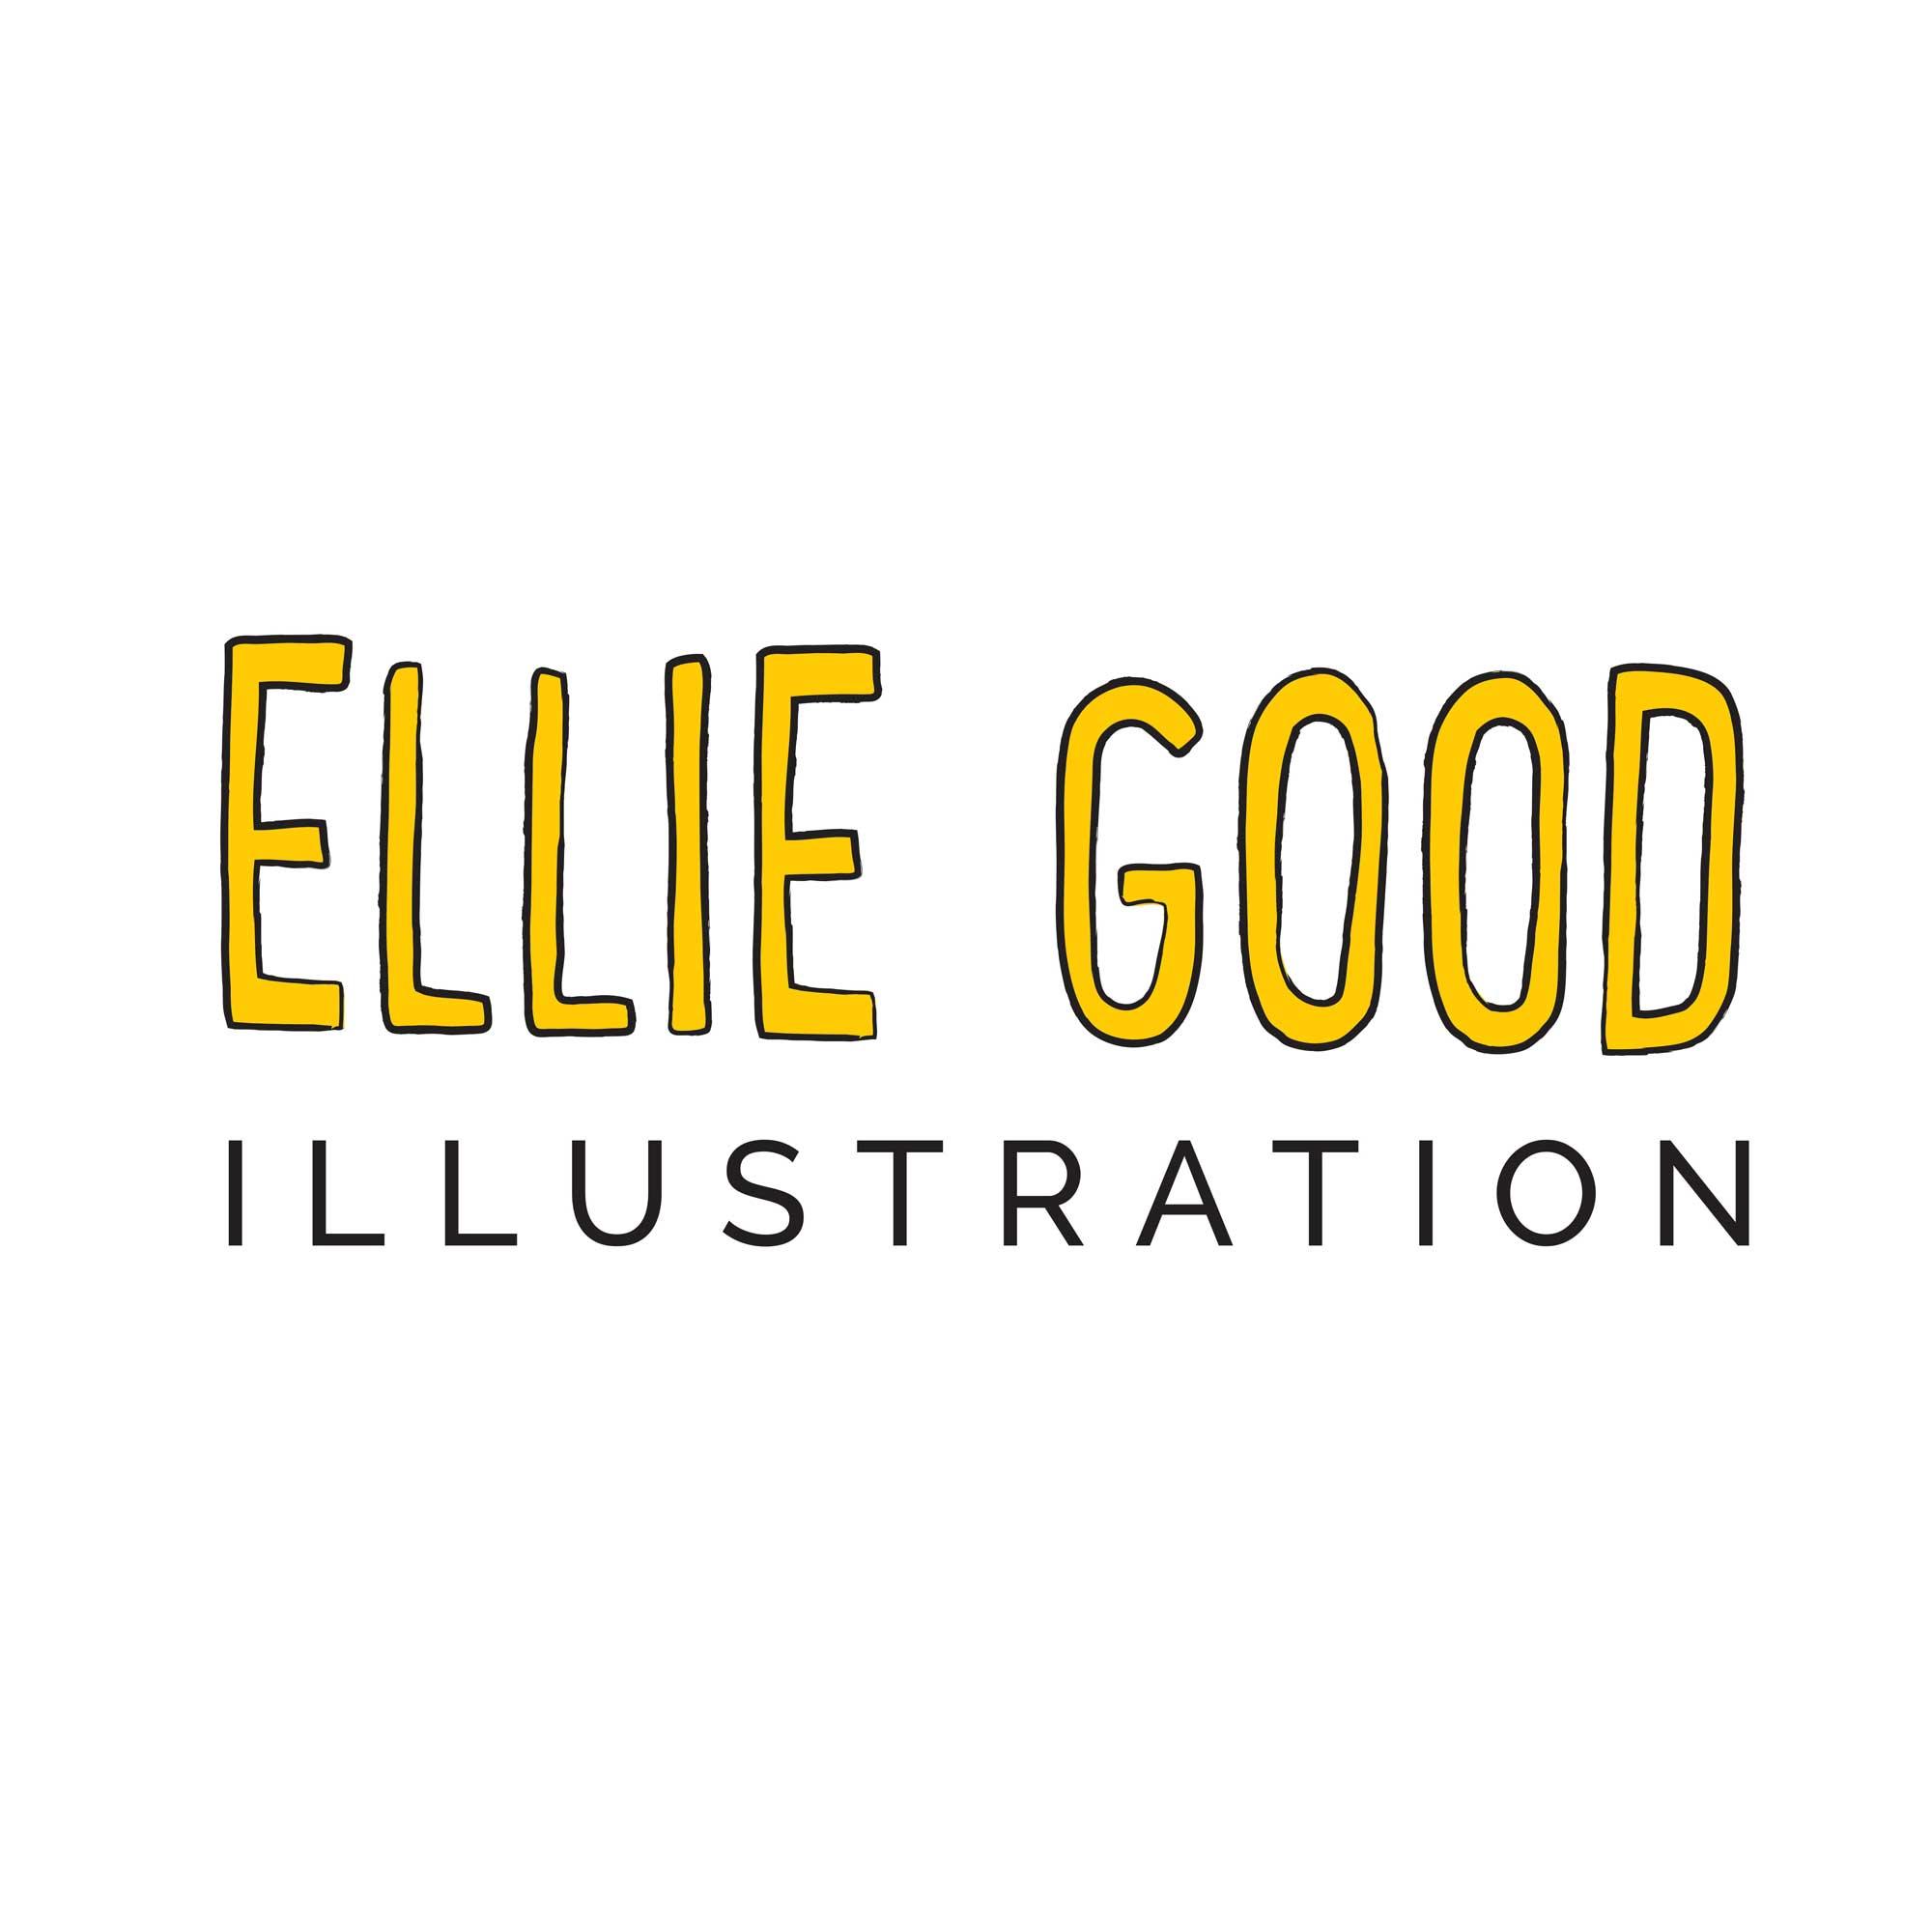 Ellie Good Illustration